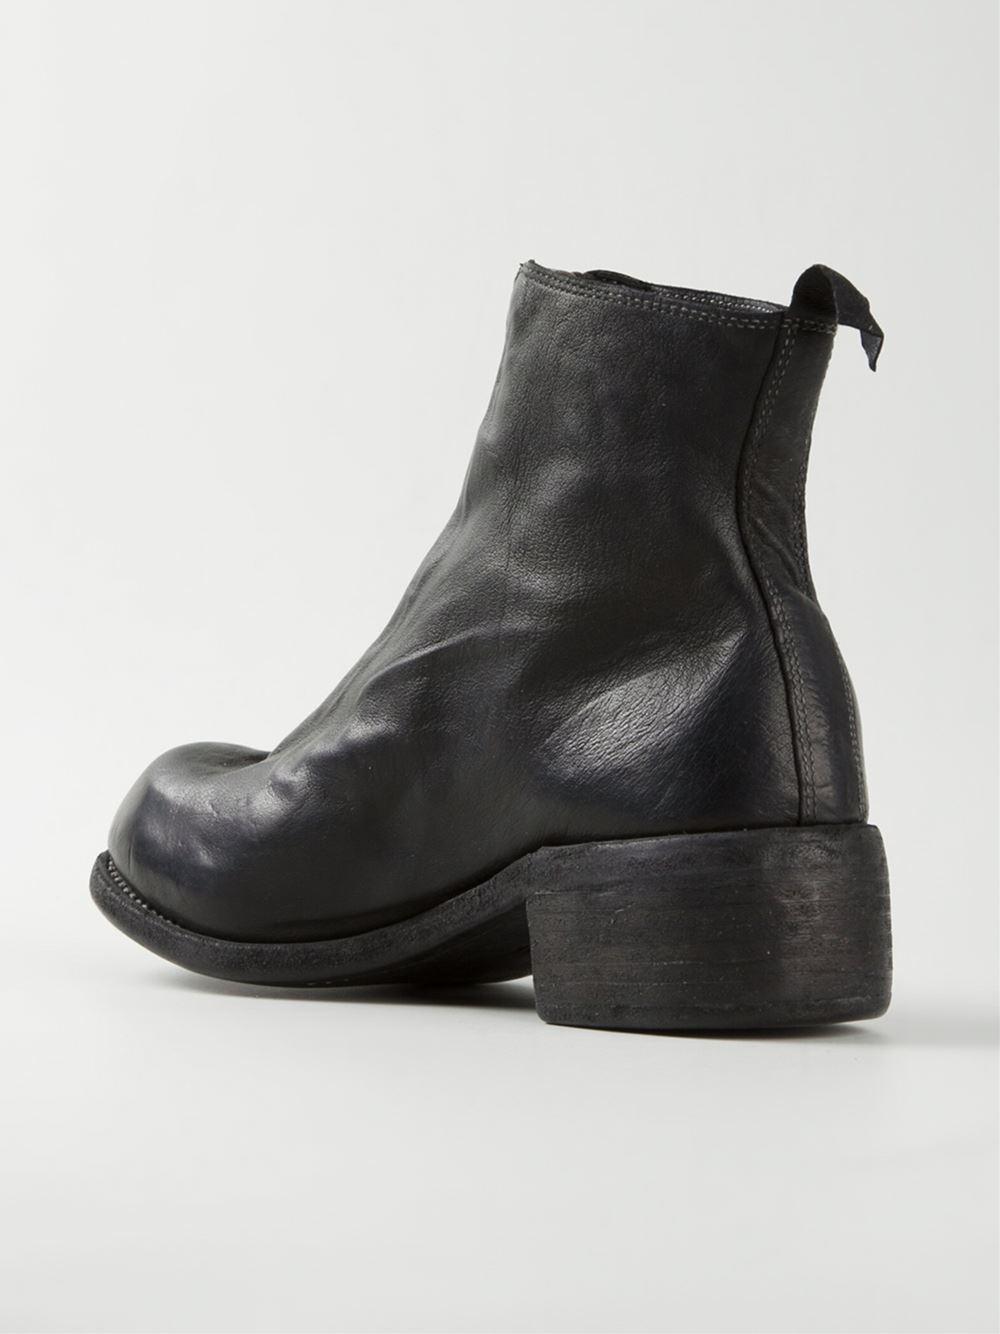 Bottines Zippées Guidi - Noir LyShkzp